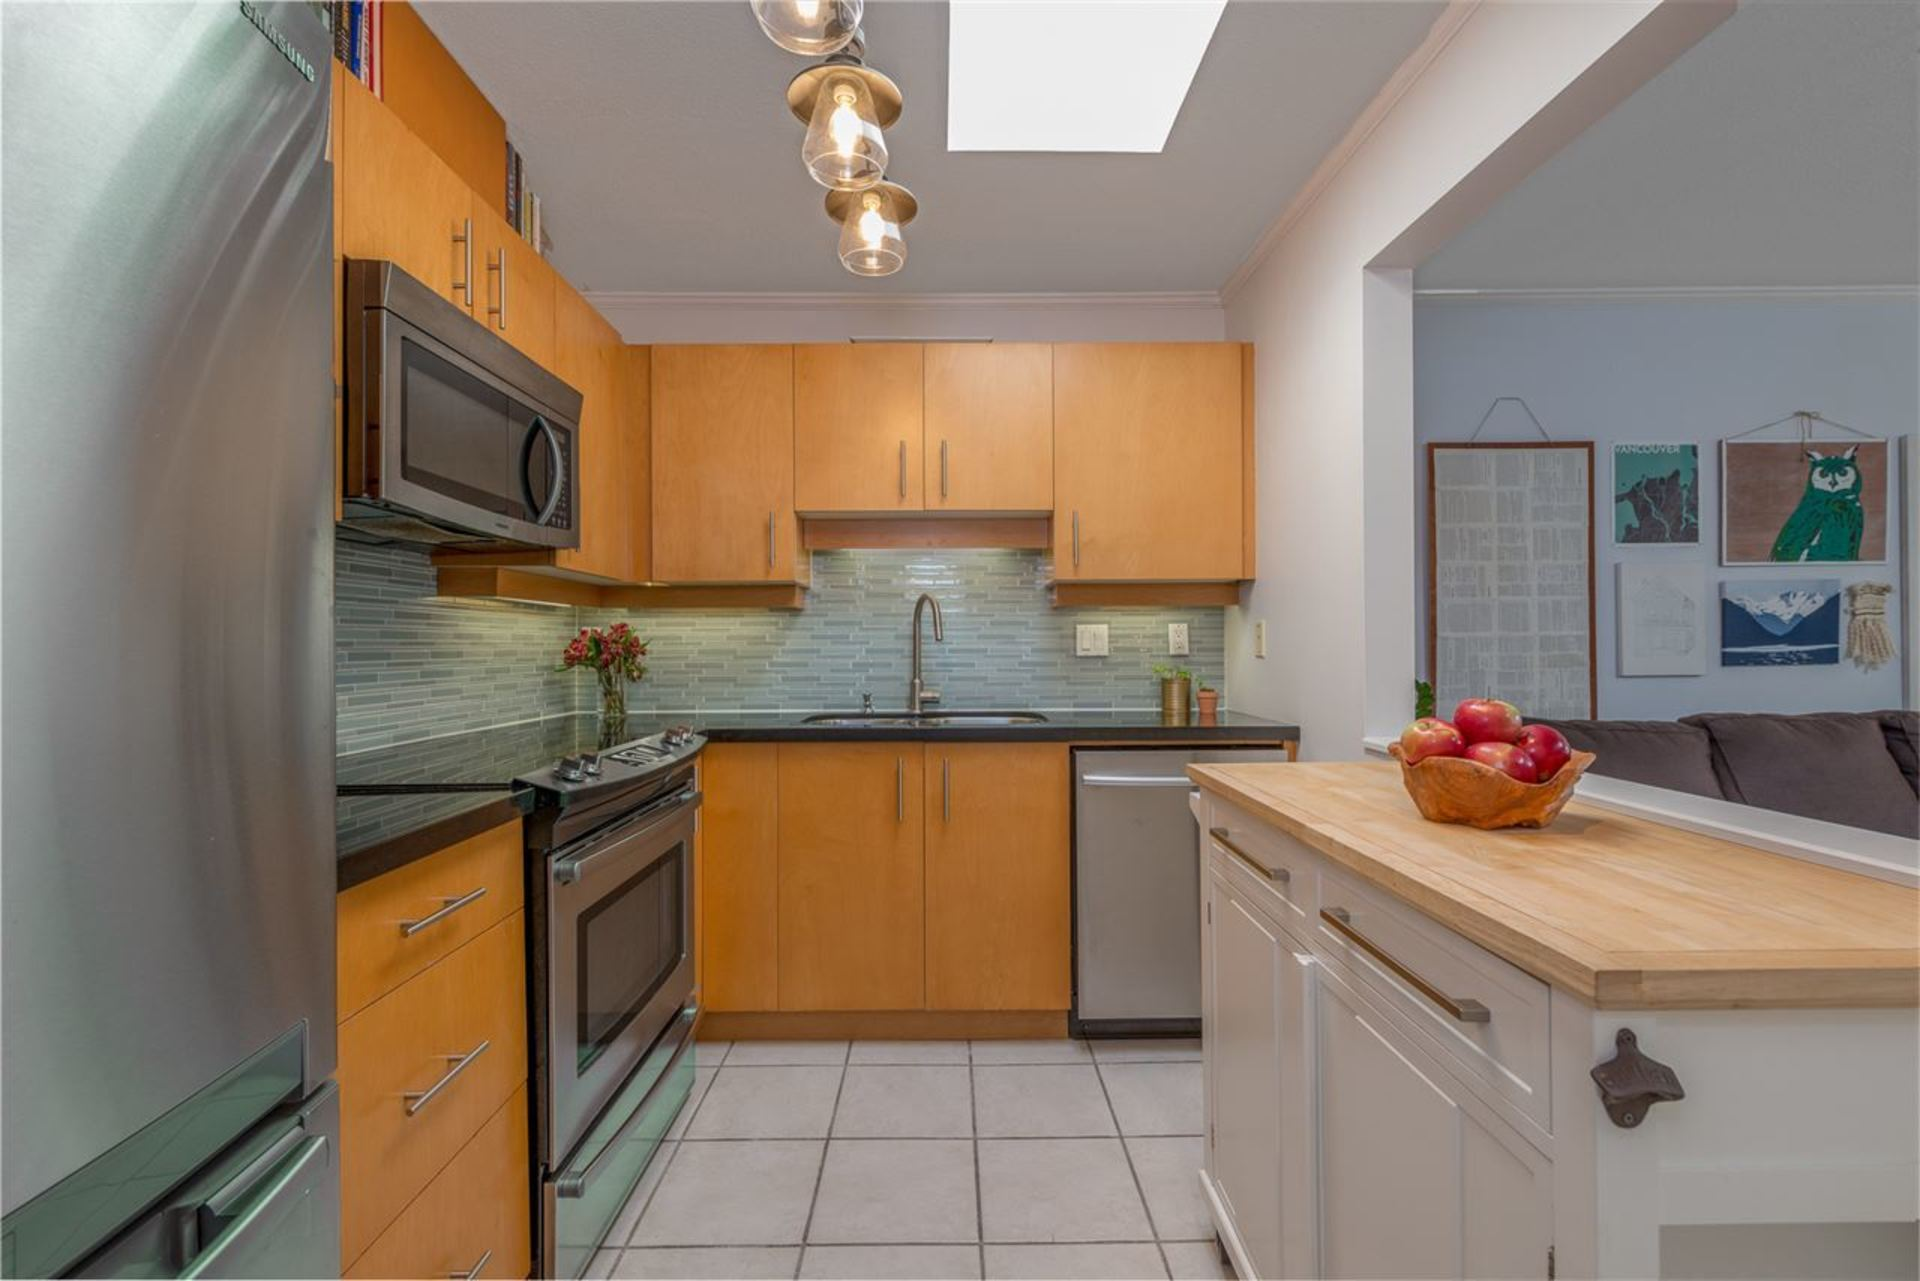 108-w-esplanade-avenue-lower-lonsdale-north-vancouver-04 at 407 - 108 W Esplanade Avenue, Lower Lonsdale, North Vancouver